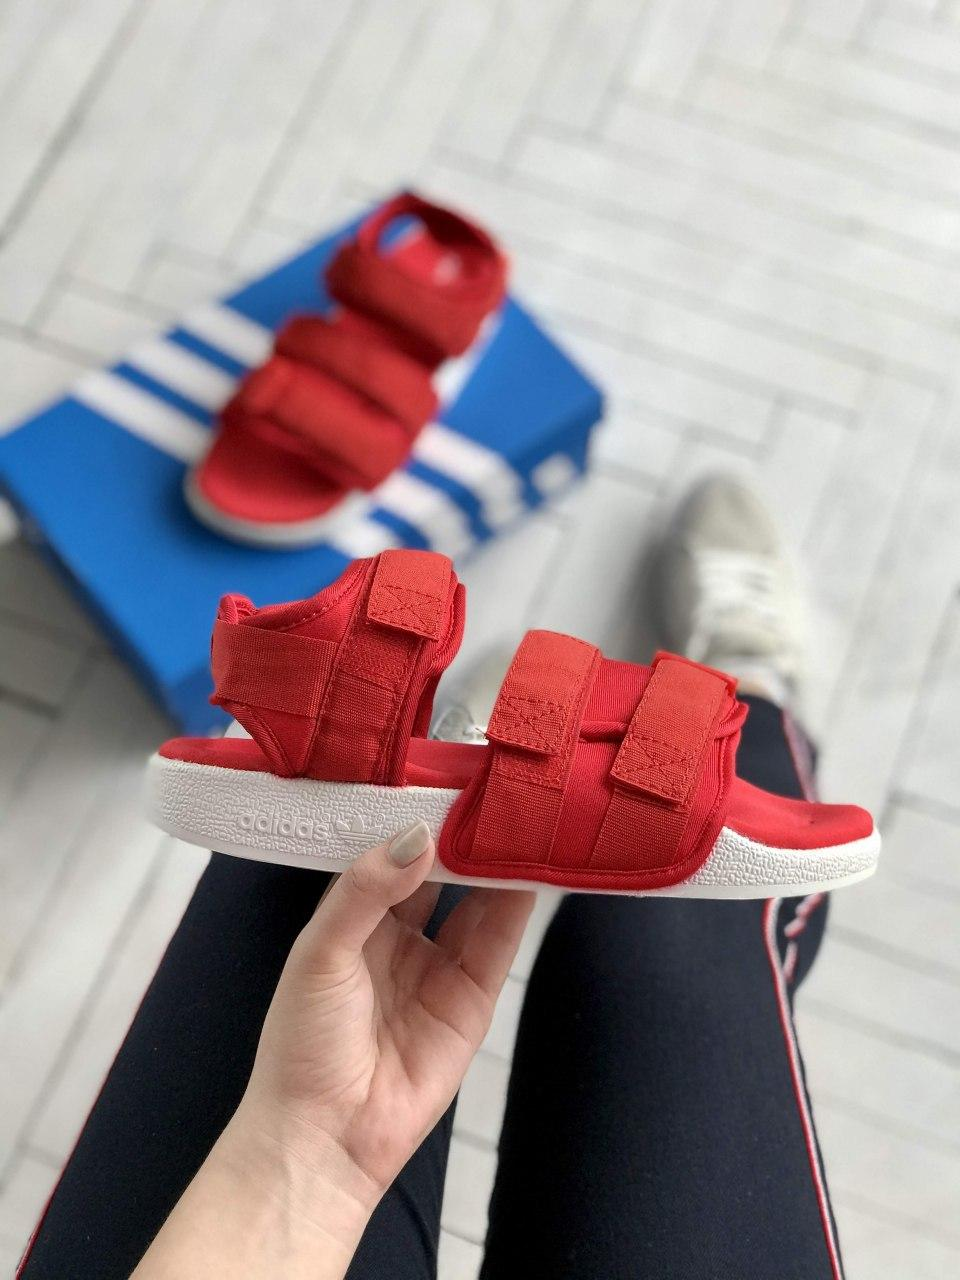 Босоножки женские Adidas Adilette Sandals Red